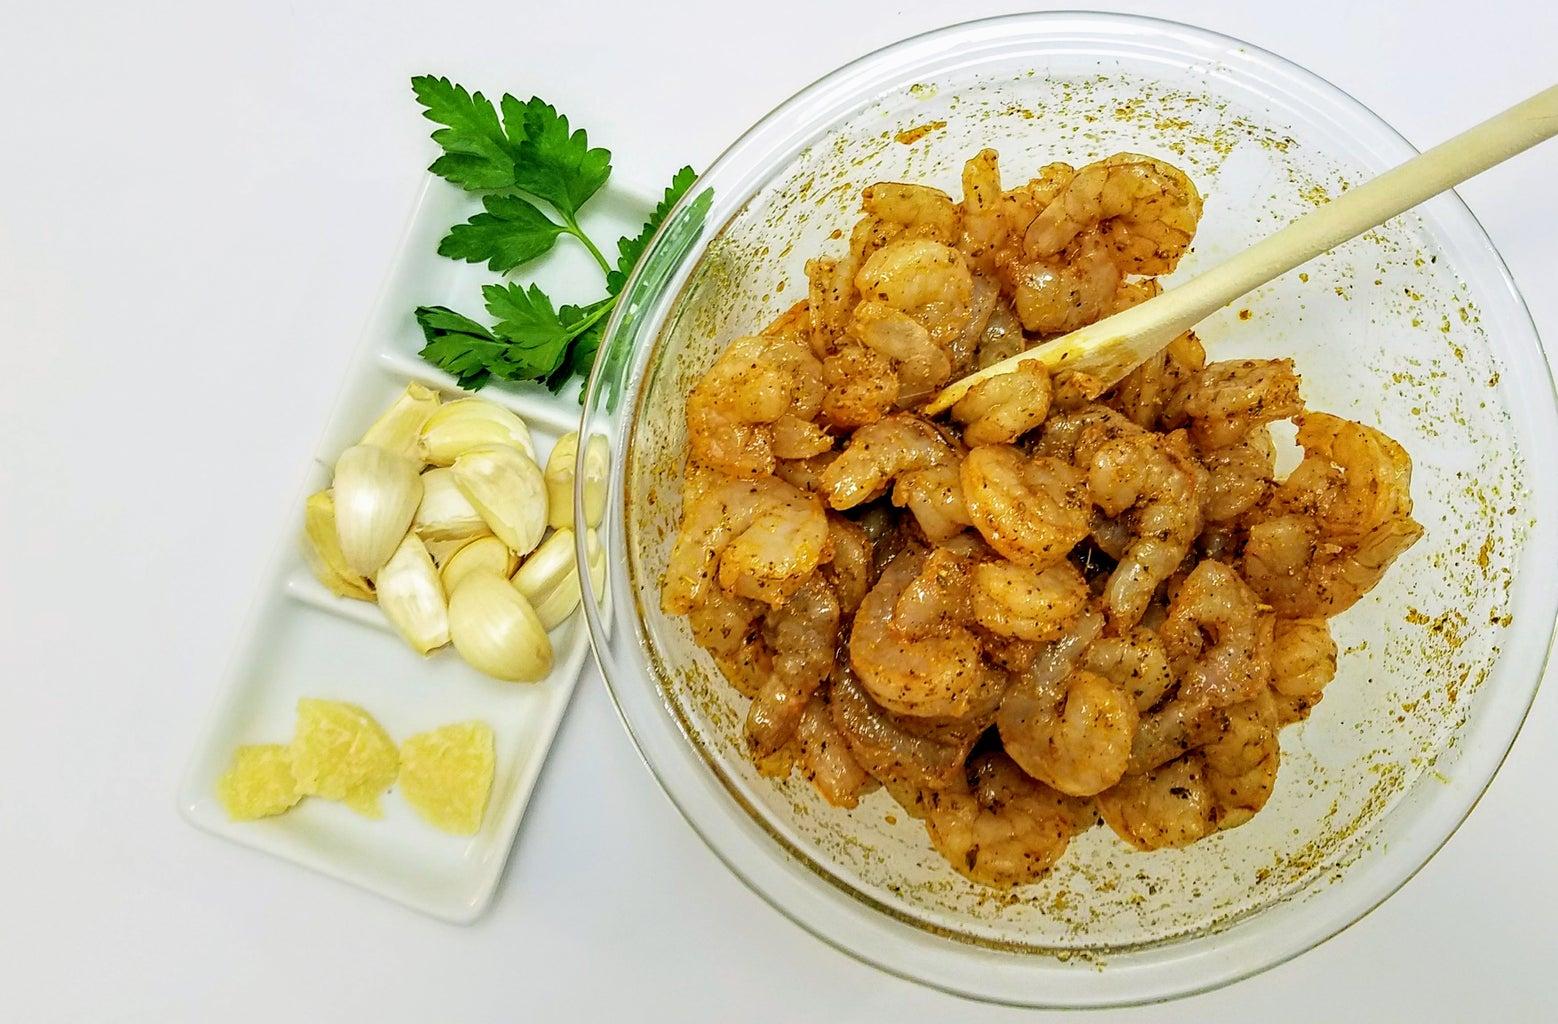 Prepare the Shrimp